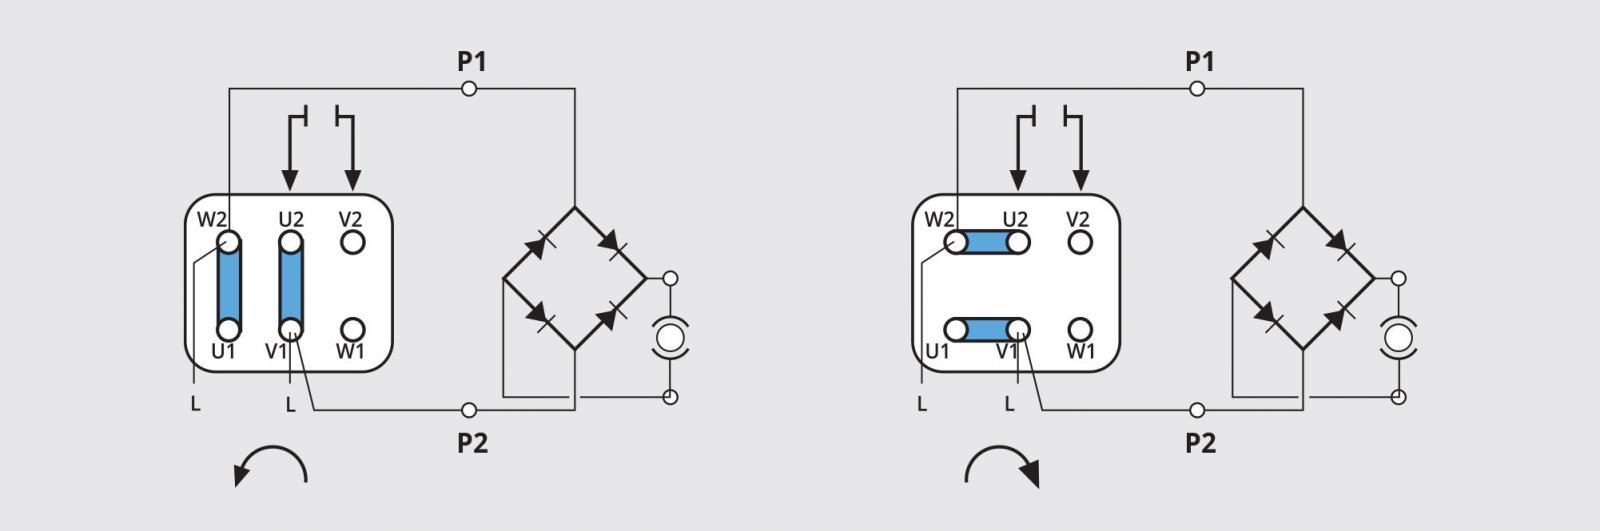 Schema Elettrico Montacarichi 220v : Motore monofase autofrenante neri motori s r l